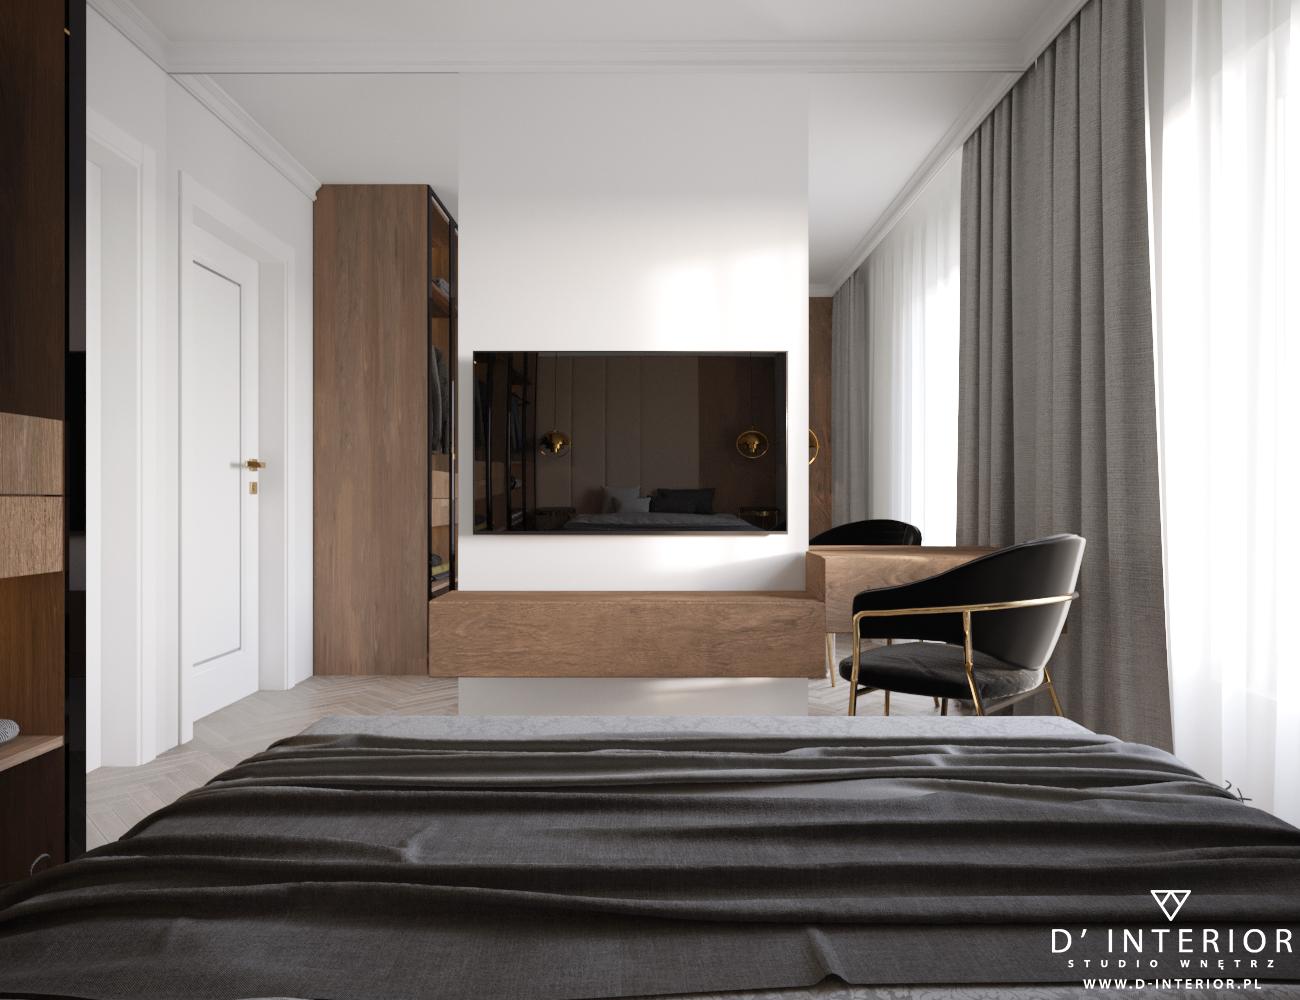 Telewizor w sypialni